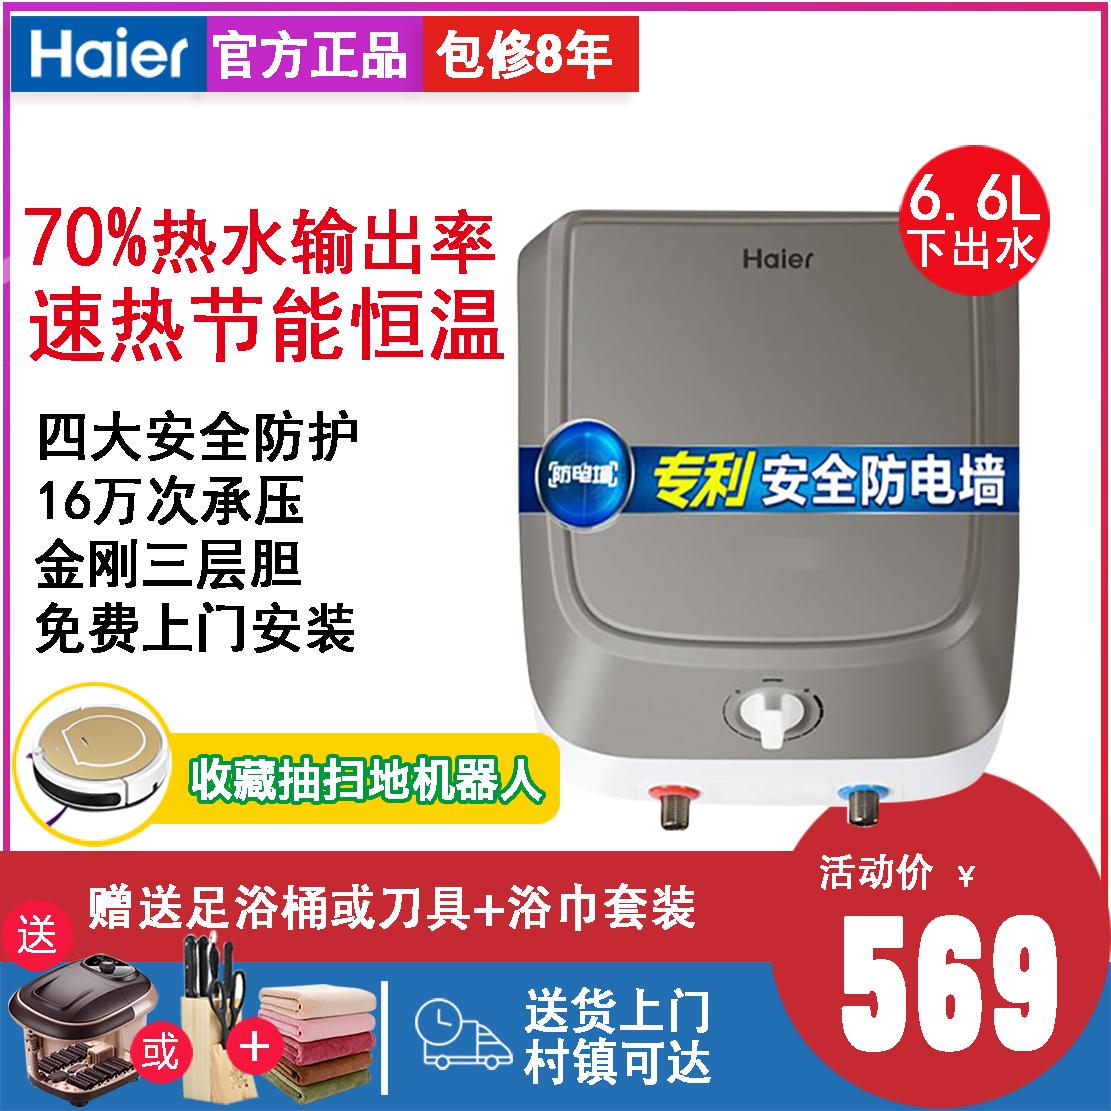 Haier-海尔 ES6.6F海尔小厨宝下出水6.6升L速热式电热水器挂墙